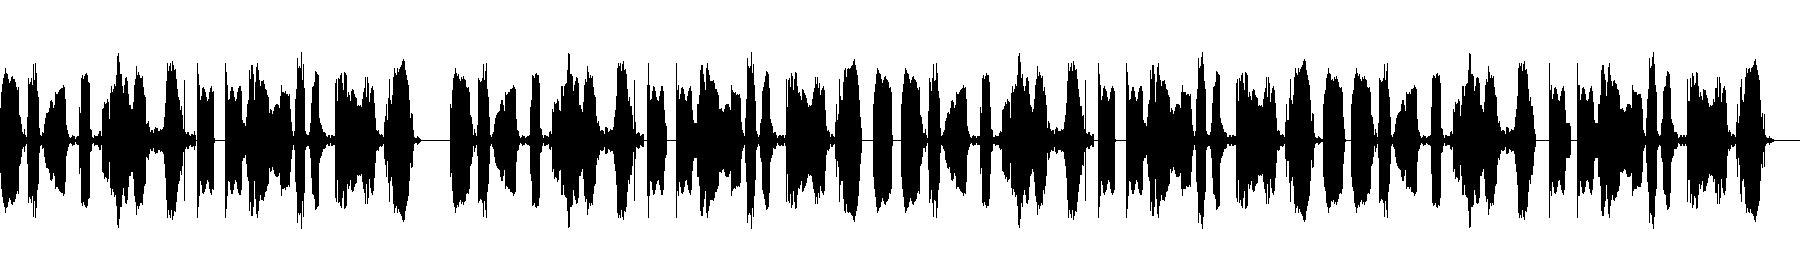 ebmin 123bpm vox